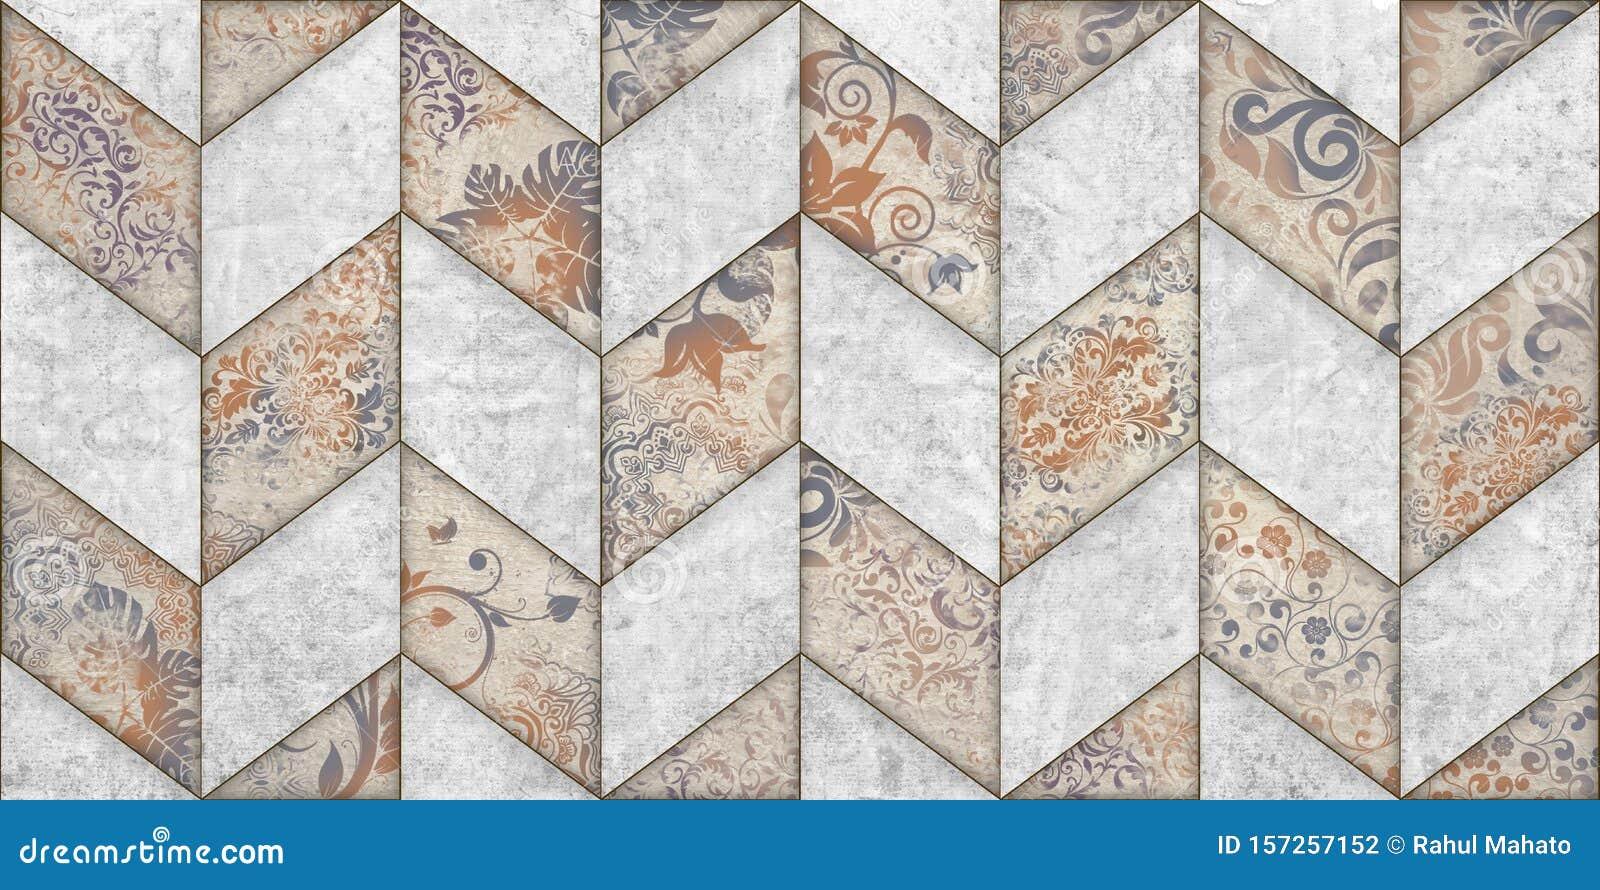 Digital Wall Art Tiles Design For Interior Home Or Ceramic Tiles Design Stock Illustration Illustration Of Retro Digital 157257152